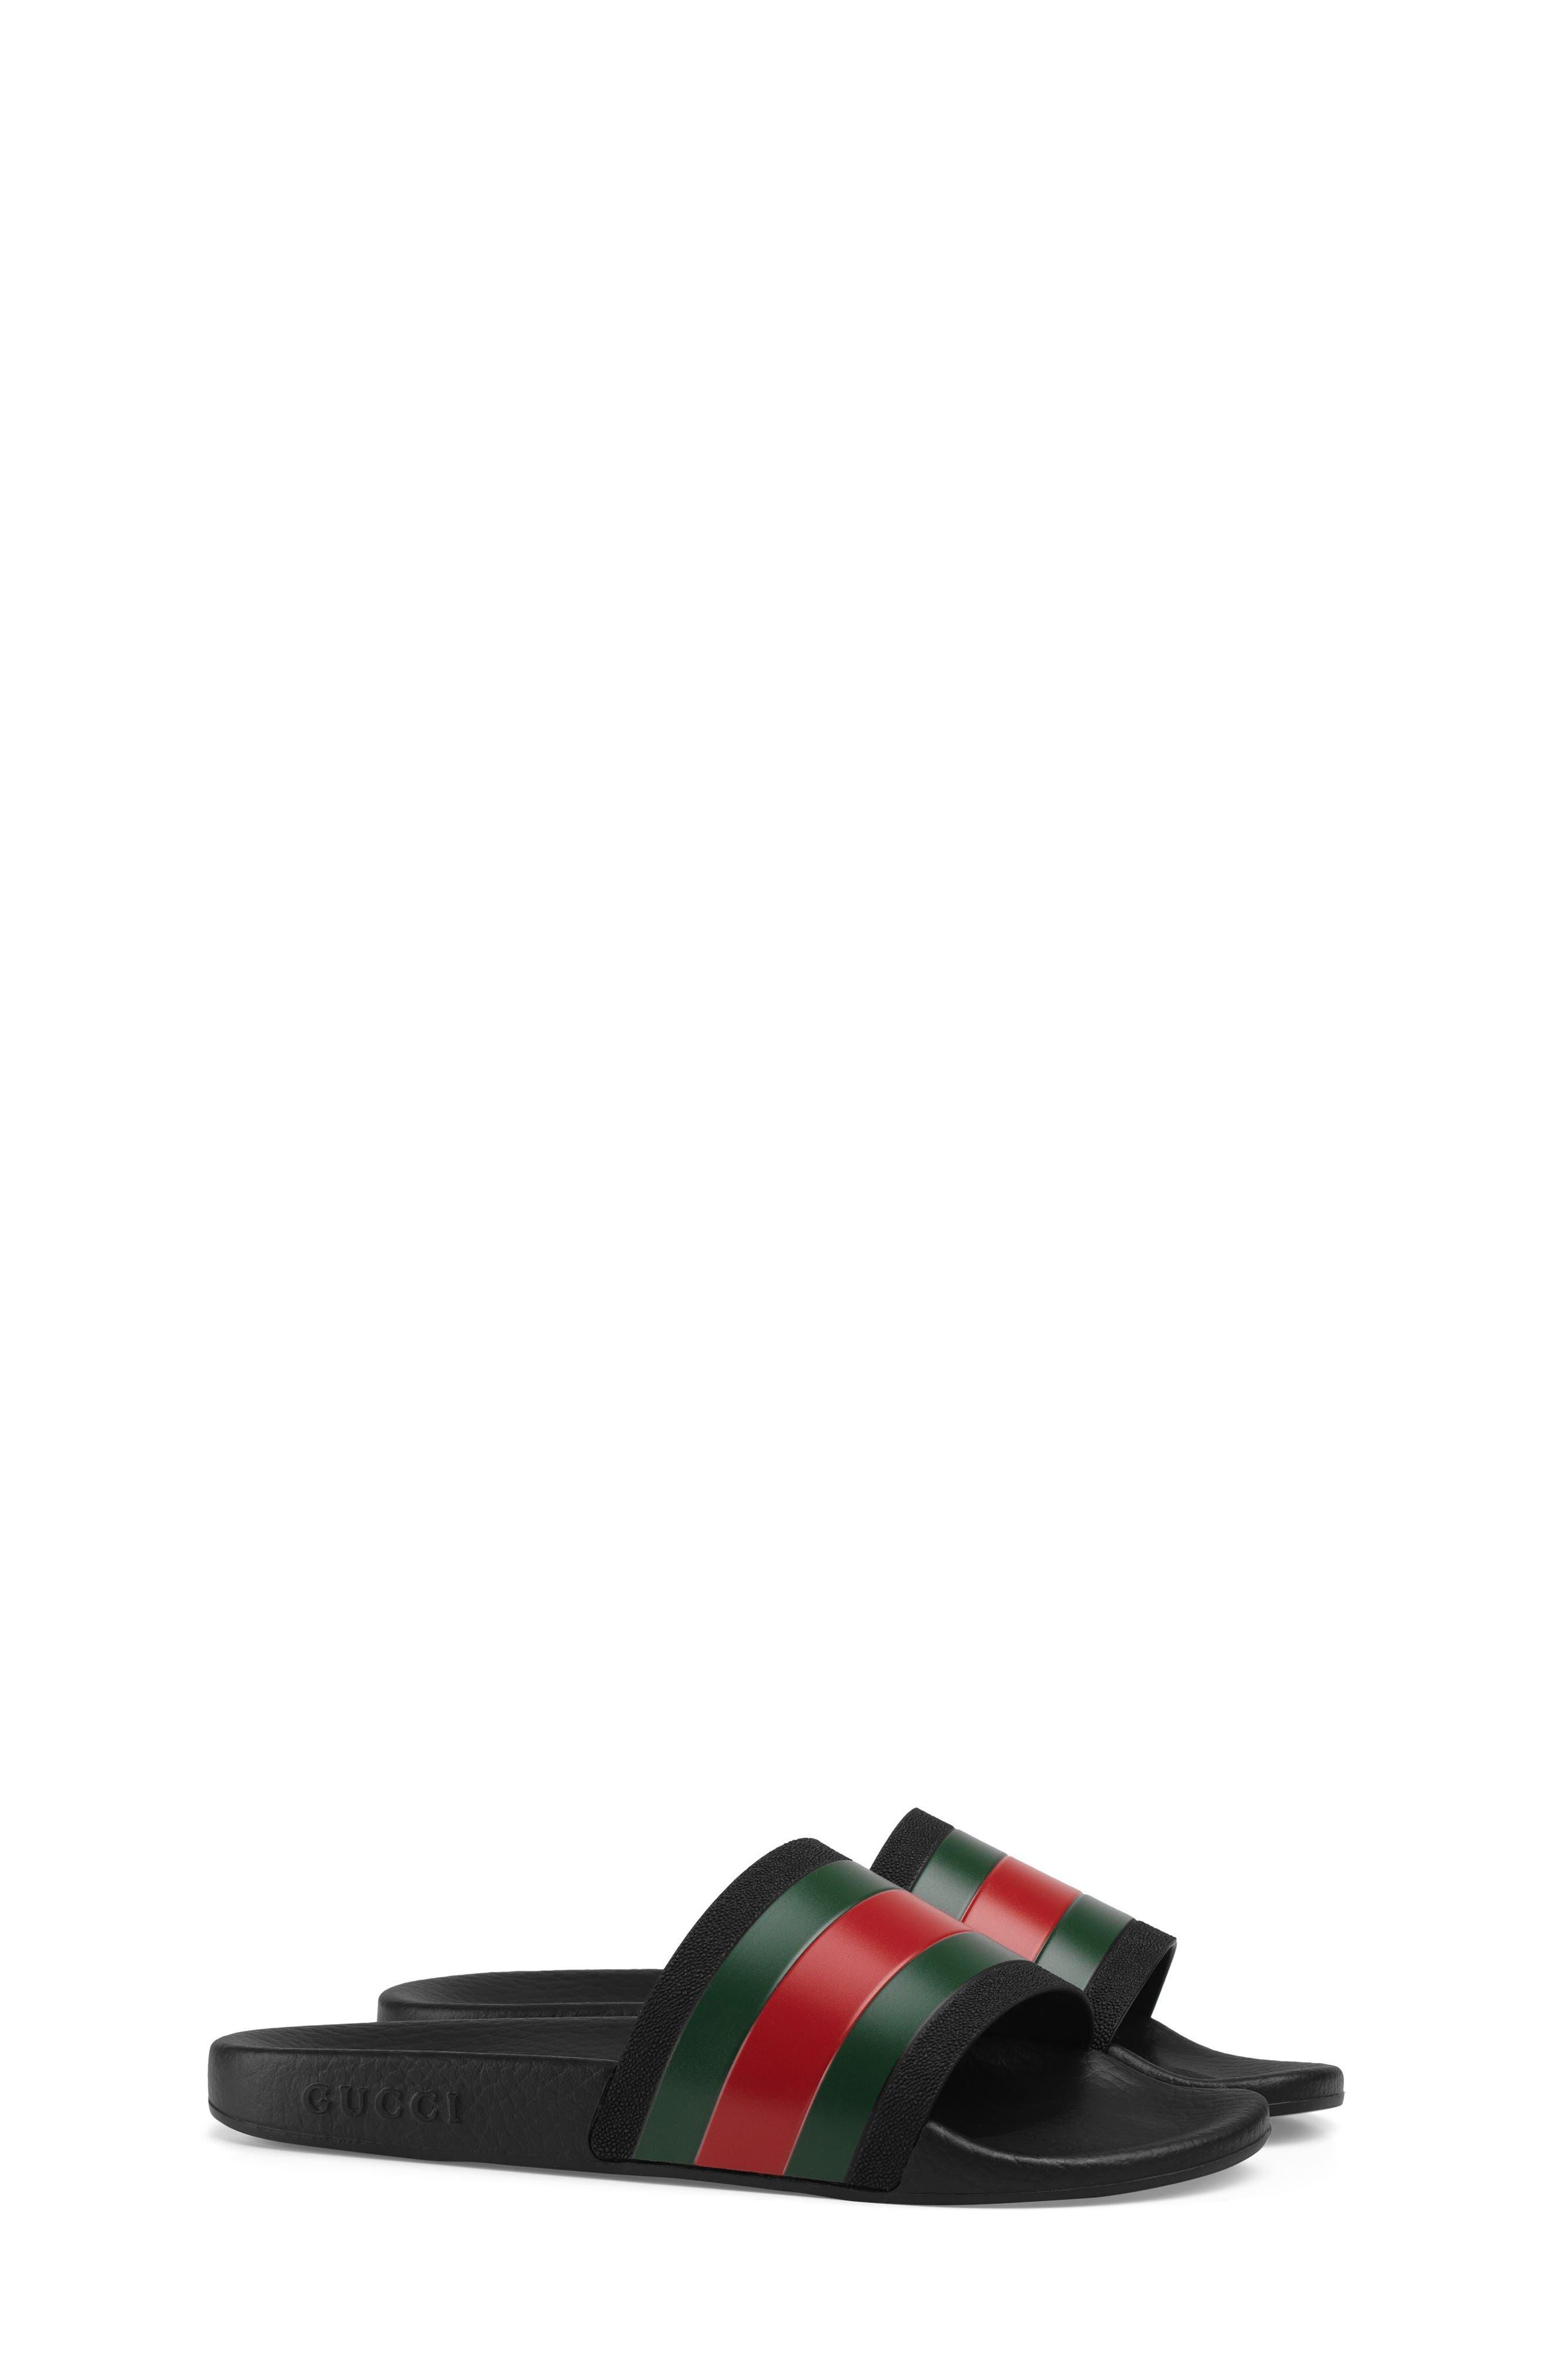 GUCCI Pursuit Slide Sandal, Main, color, BLACK/ GREEN/ RED